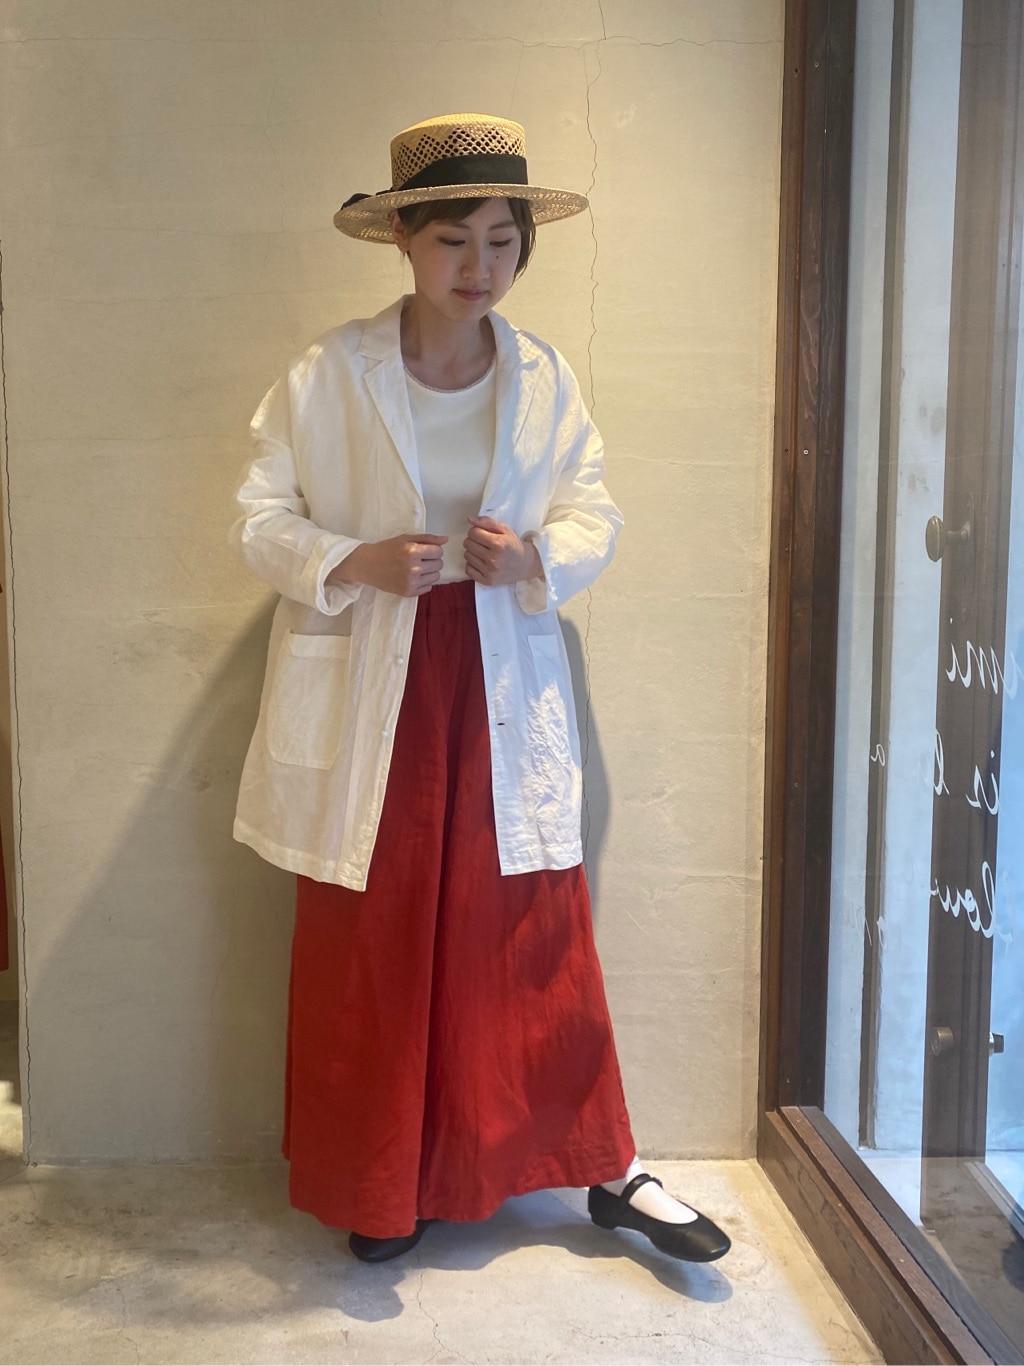 yuni 神戸路面 身長:155cm 2021.05.24